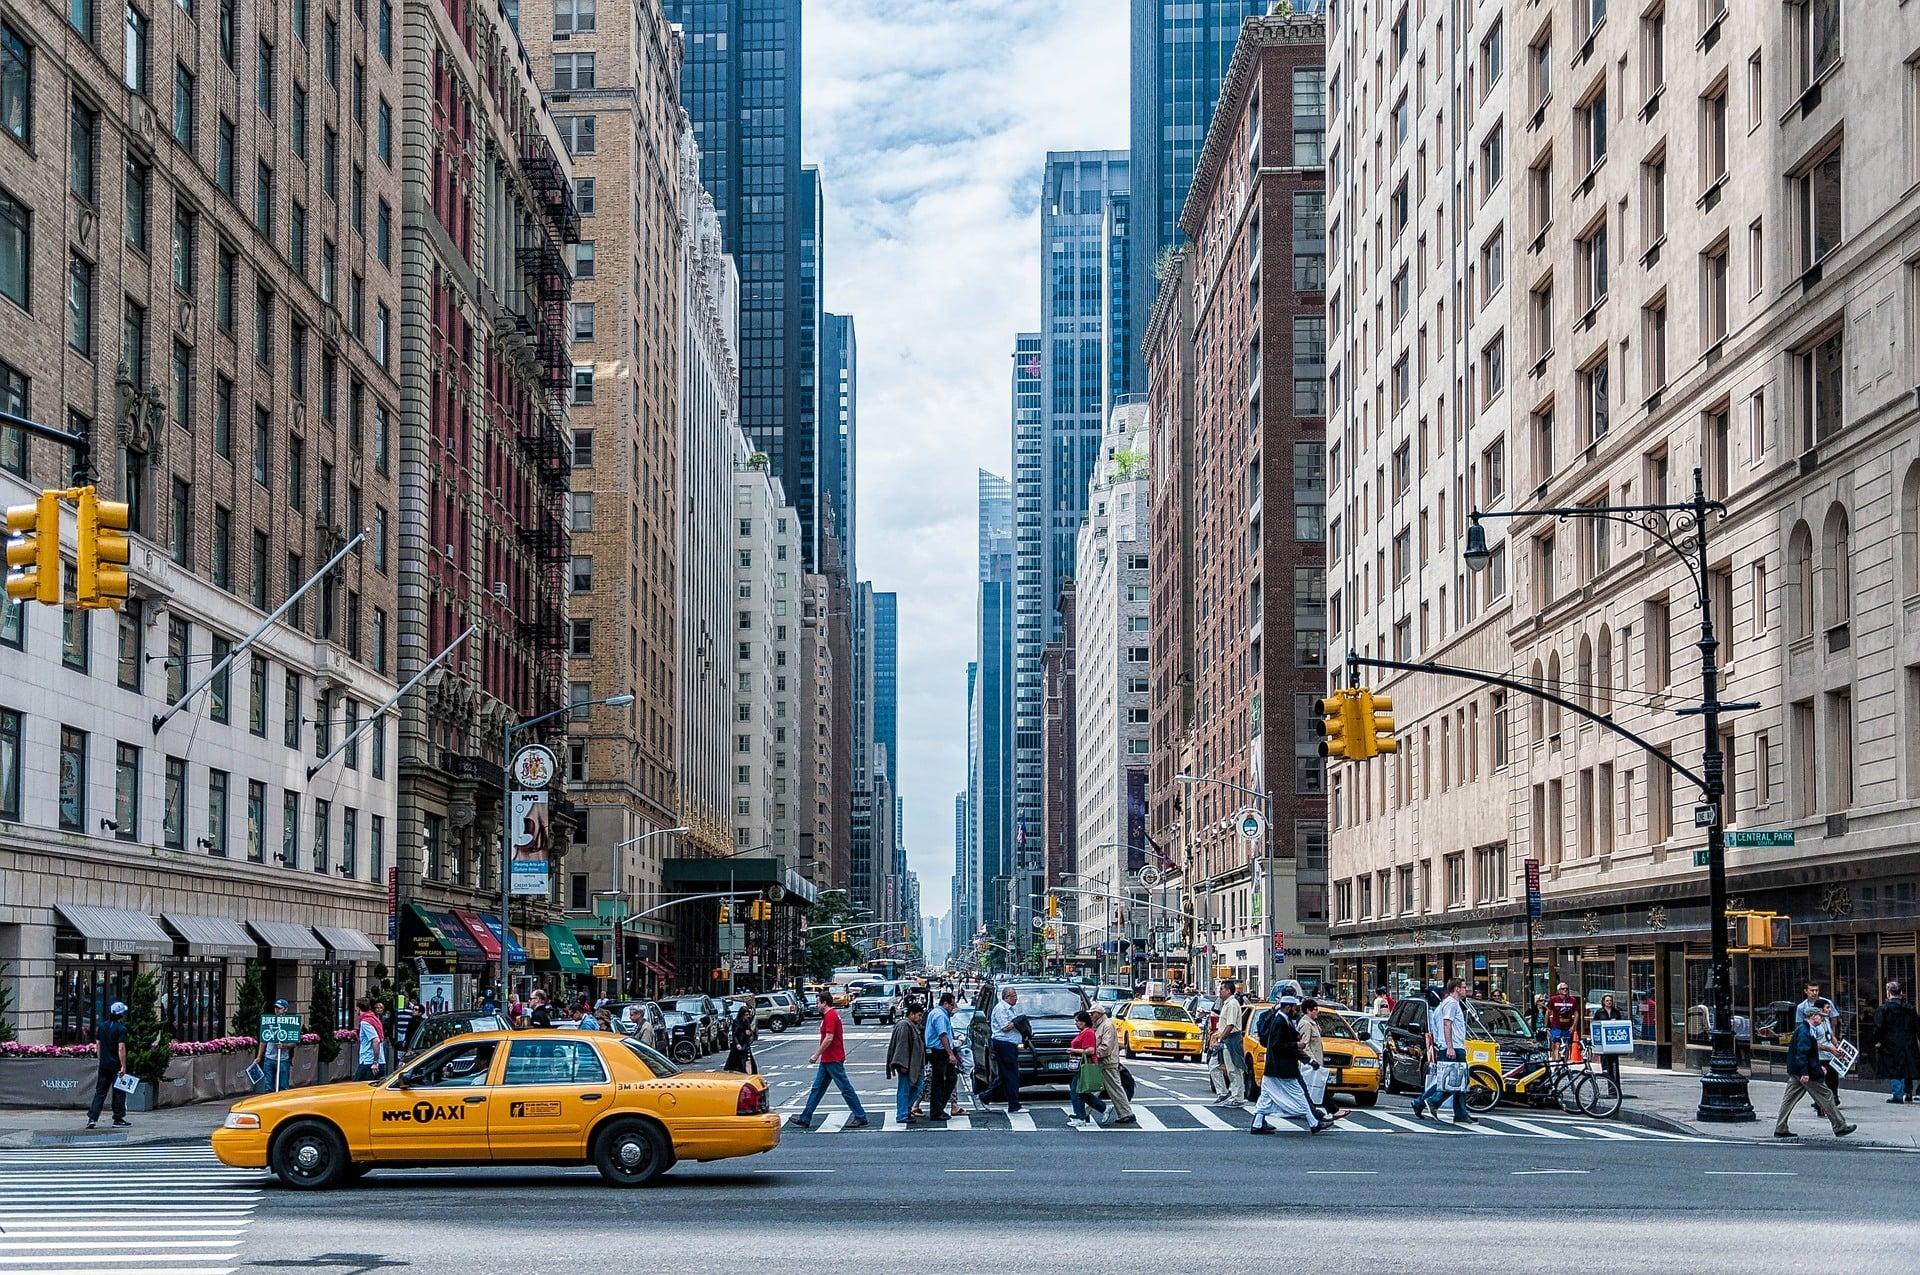 New York City 5ème Avenue